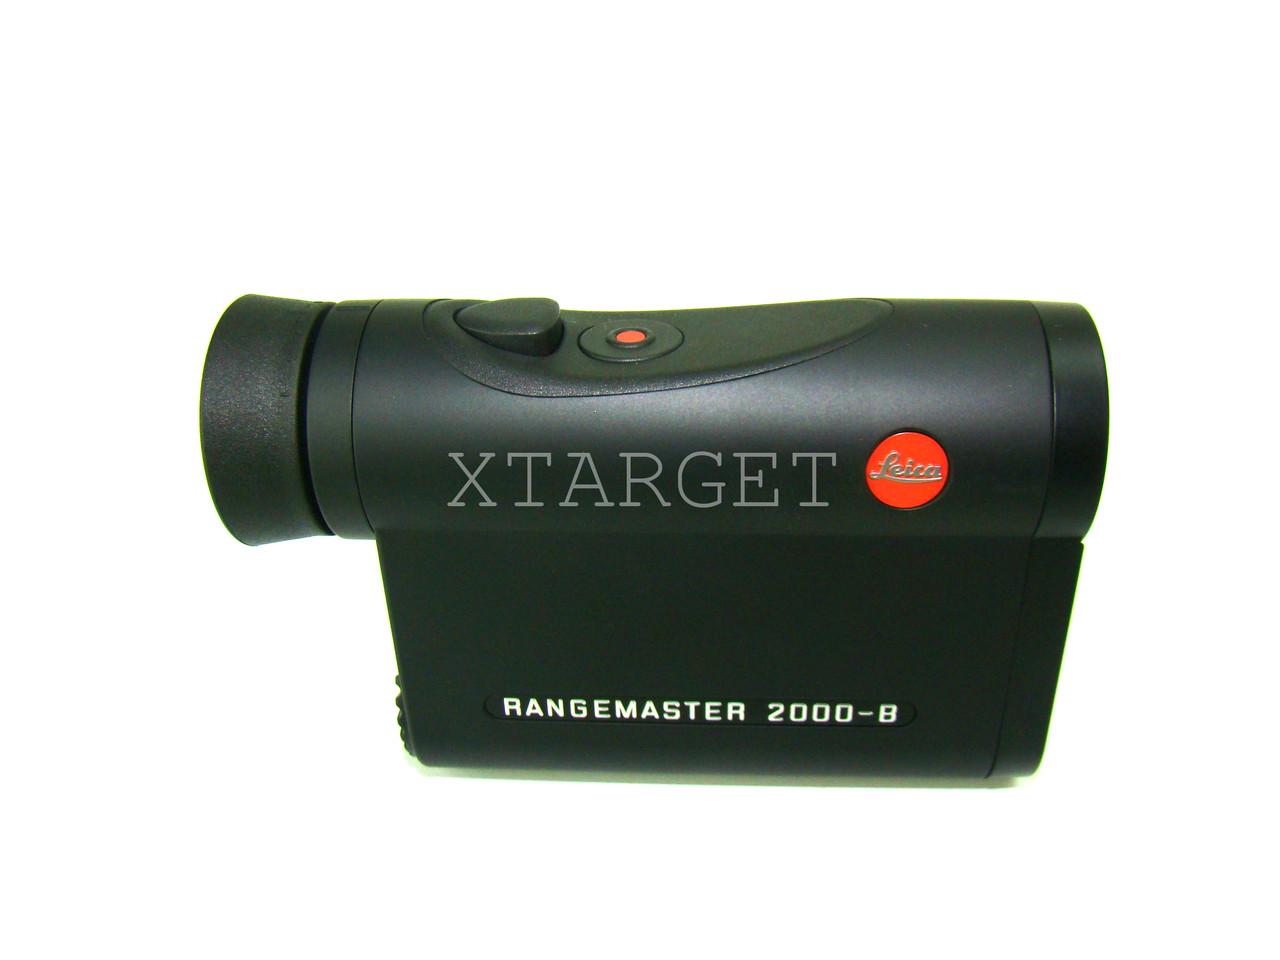 Leica Entfernungsmesser Crf 2000 B : Leica entfernungsmesser crf b geovid r store zürich